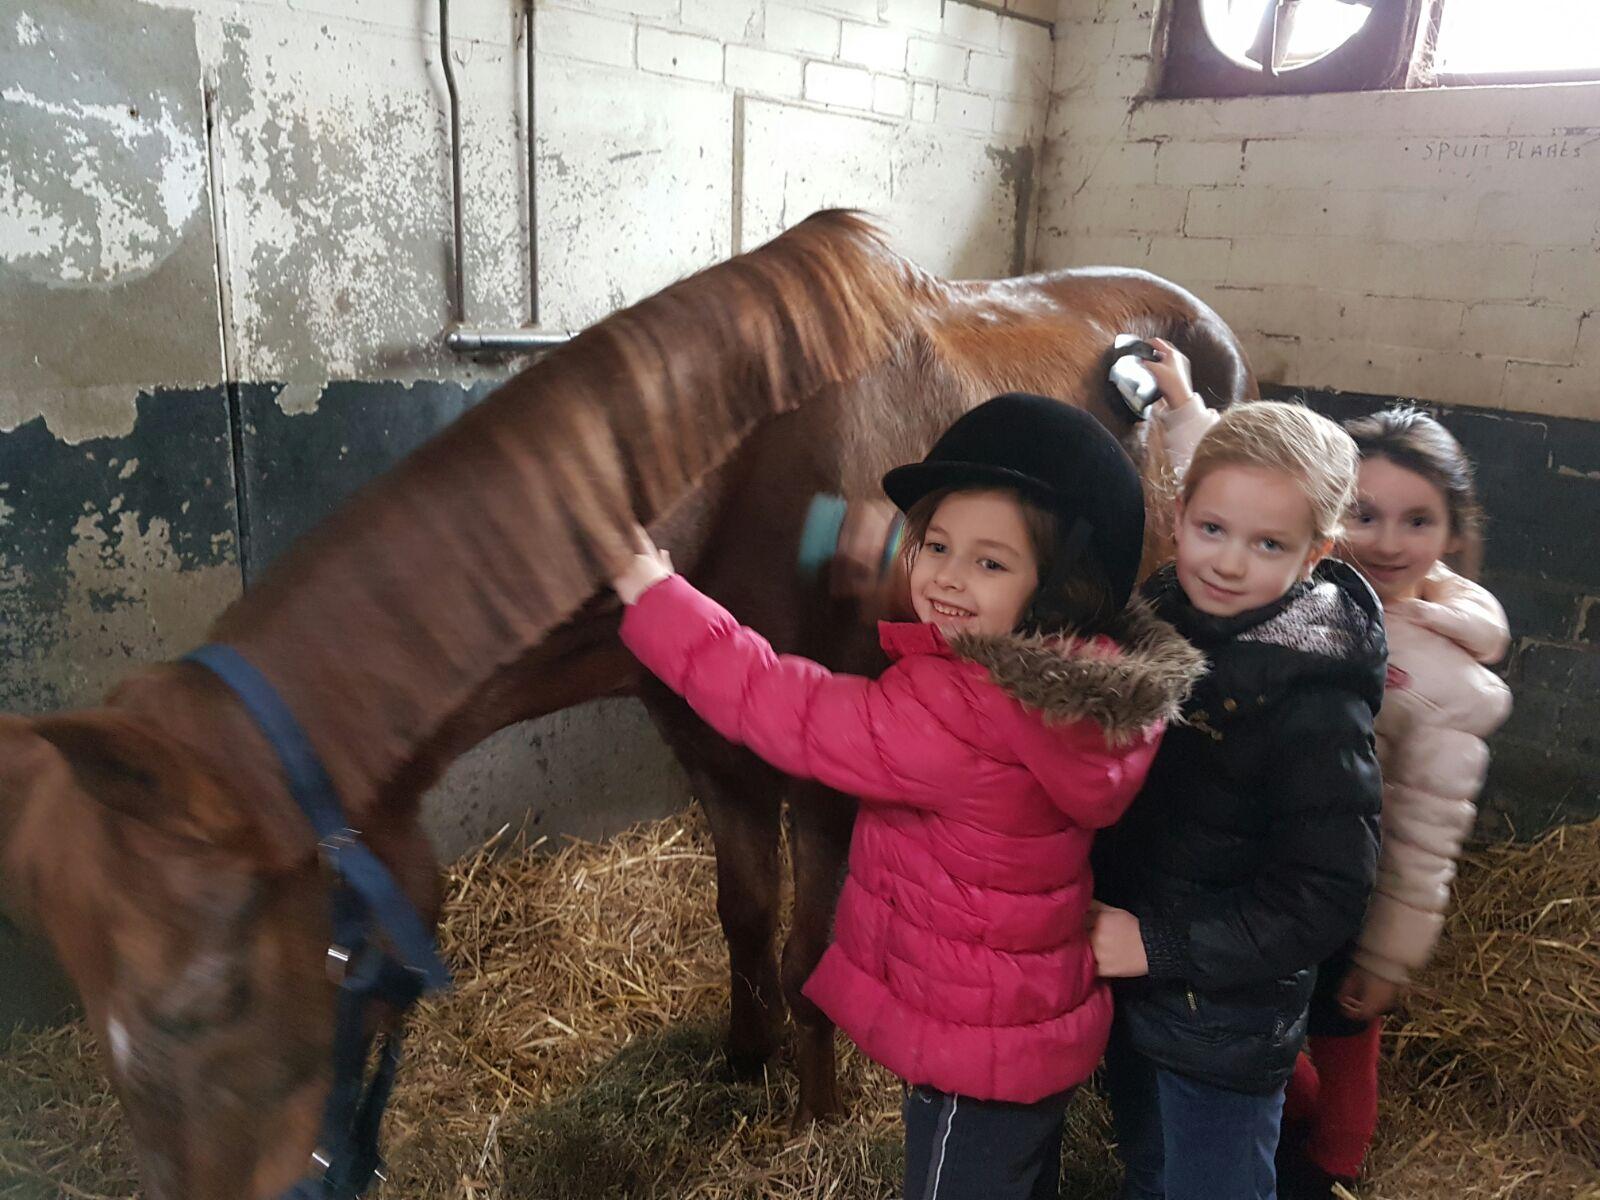 Voorkeur Kinderfeestjes - Manege 't Zandeind &TO61